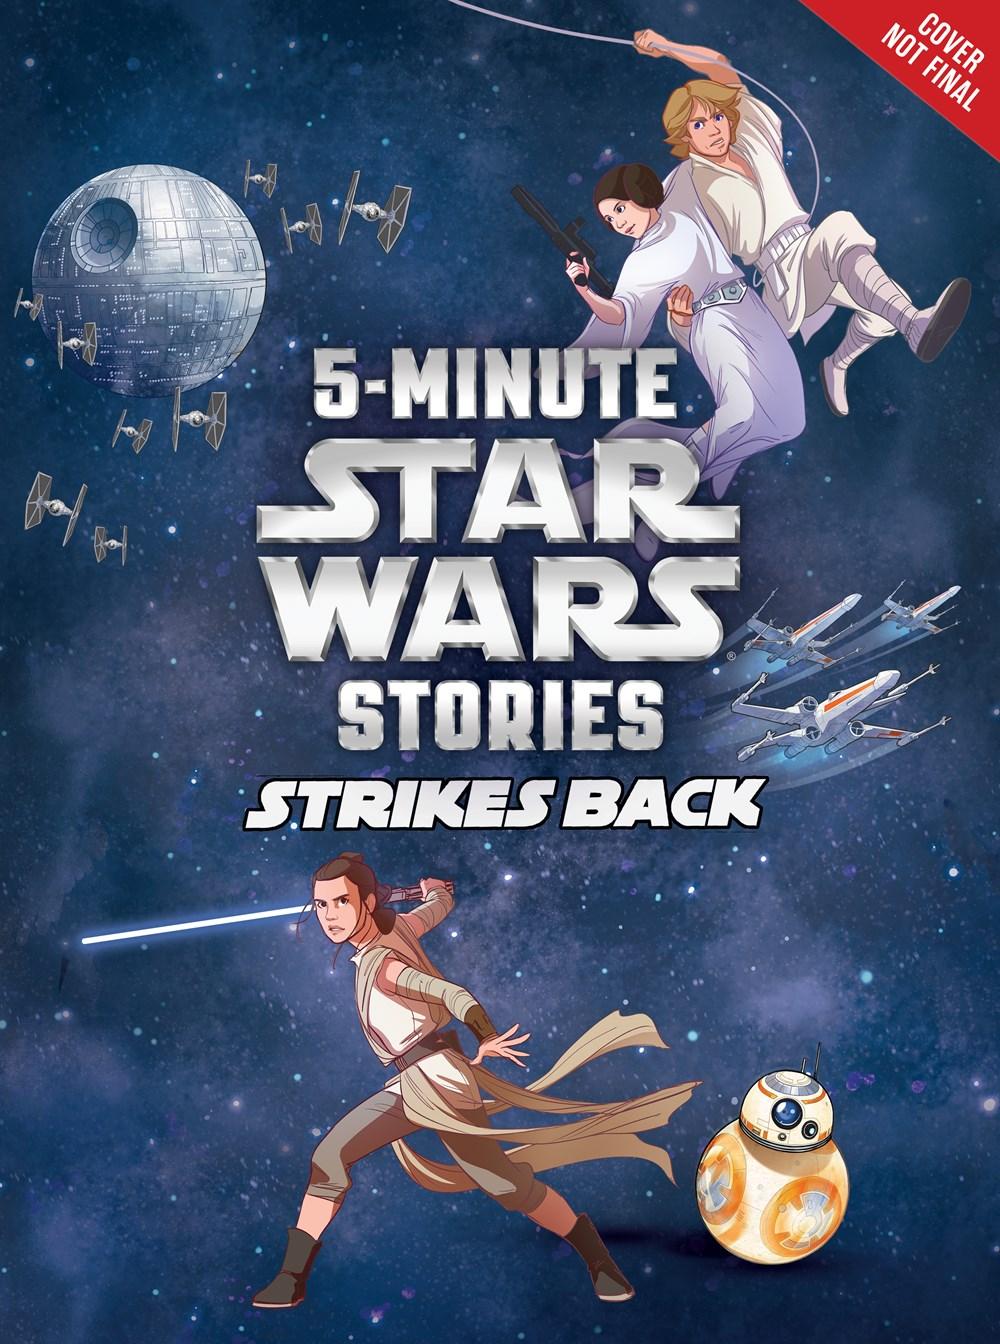 5-Minute Star Wars Stories Strikes Back Preliminary Cover.jpg